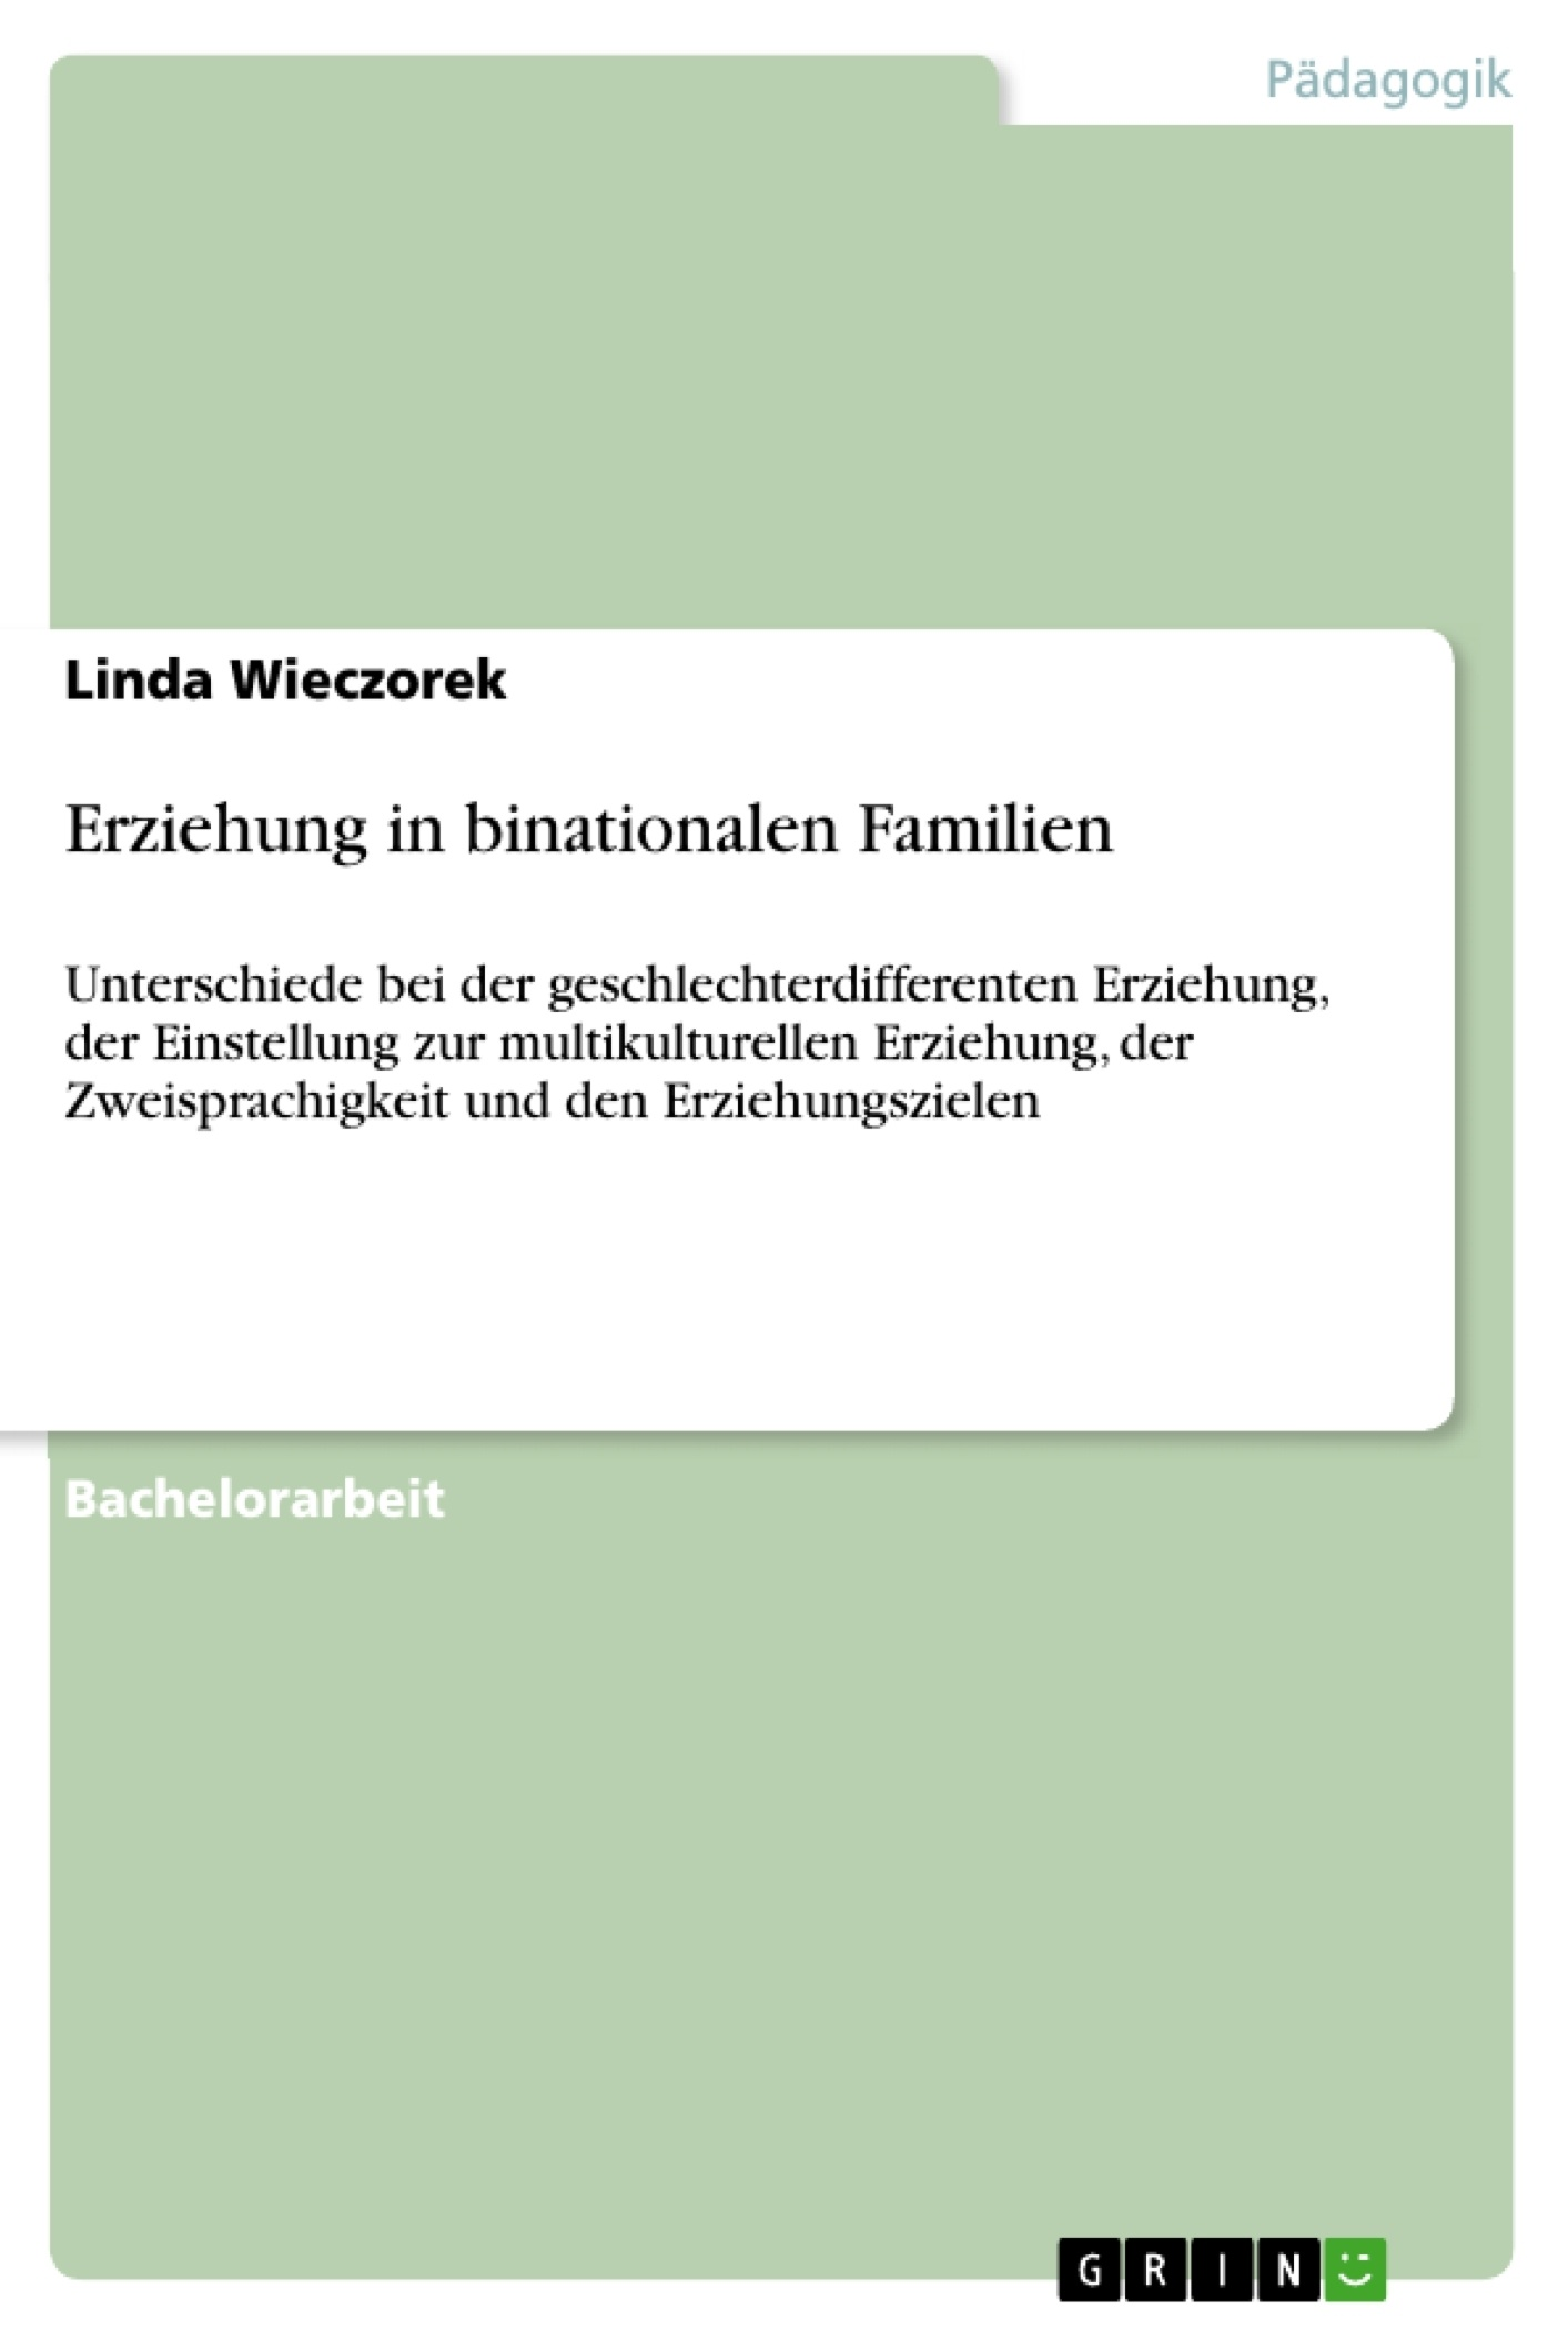 Titel: Erziehung in binationalen Familien